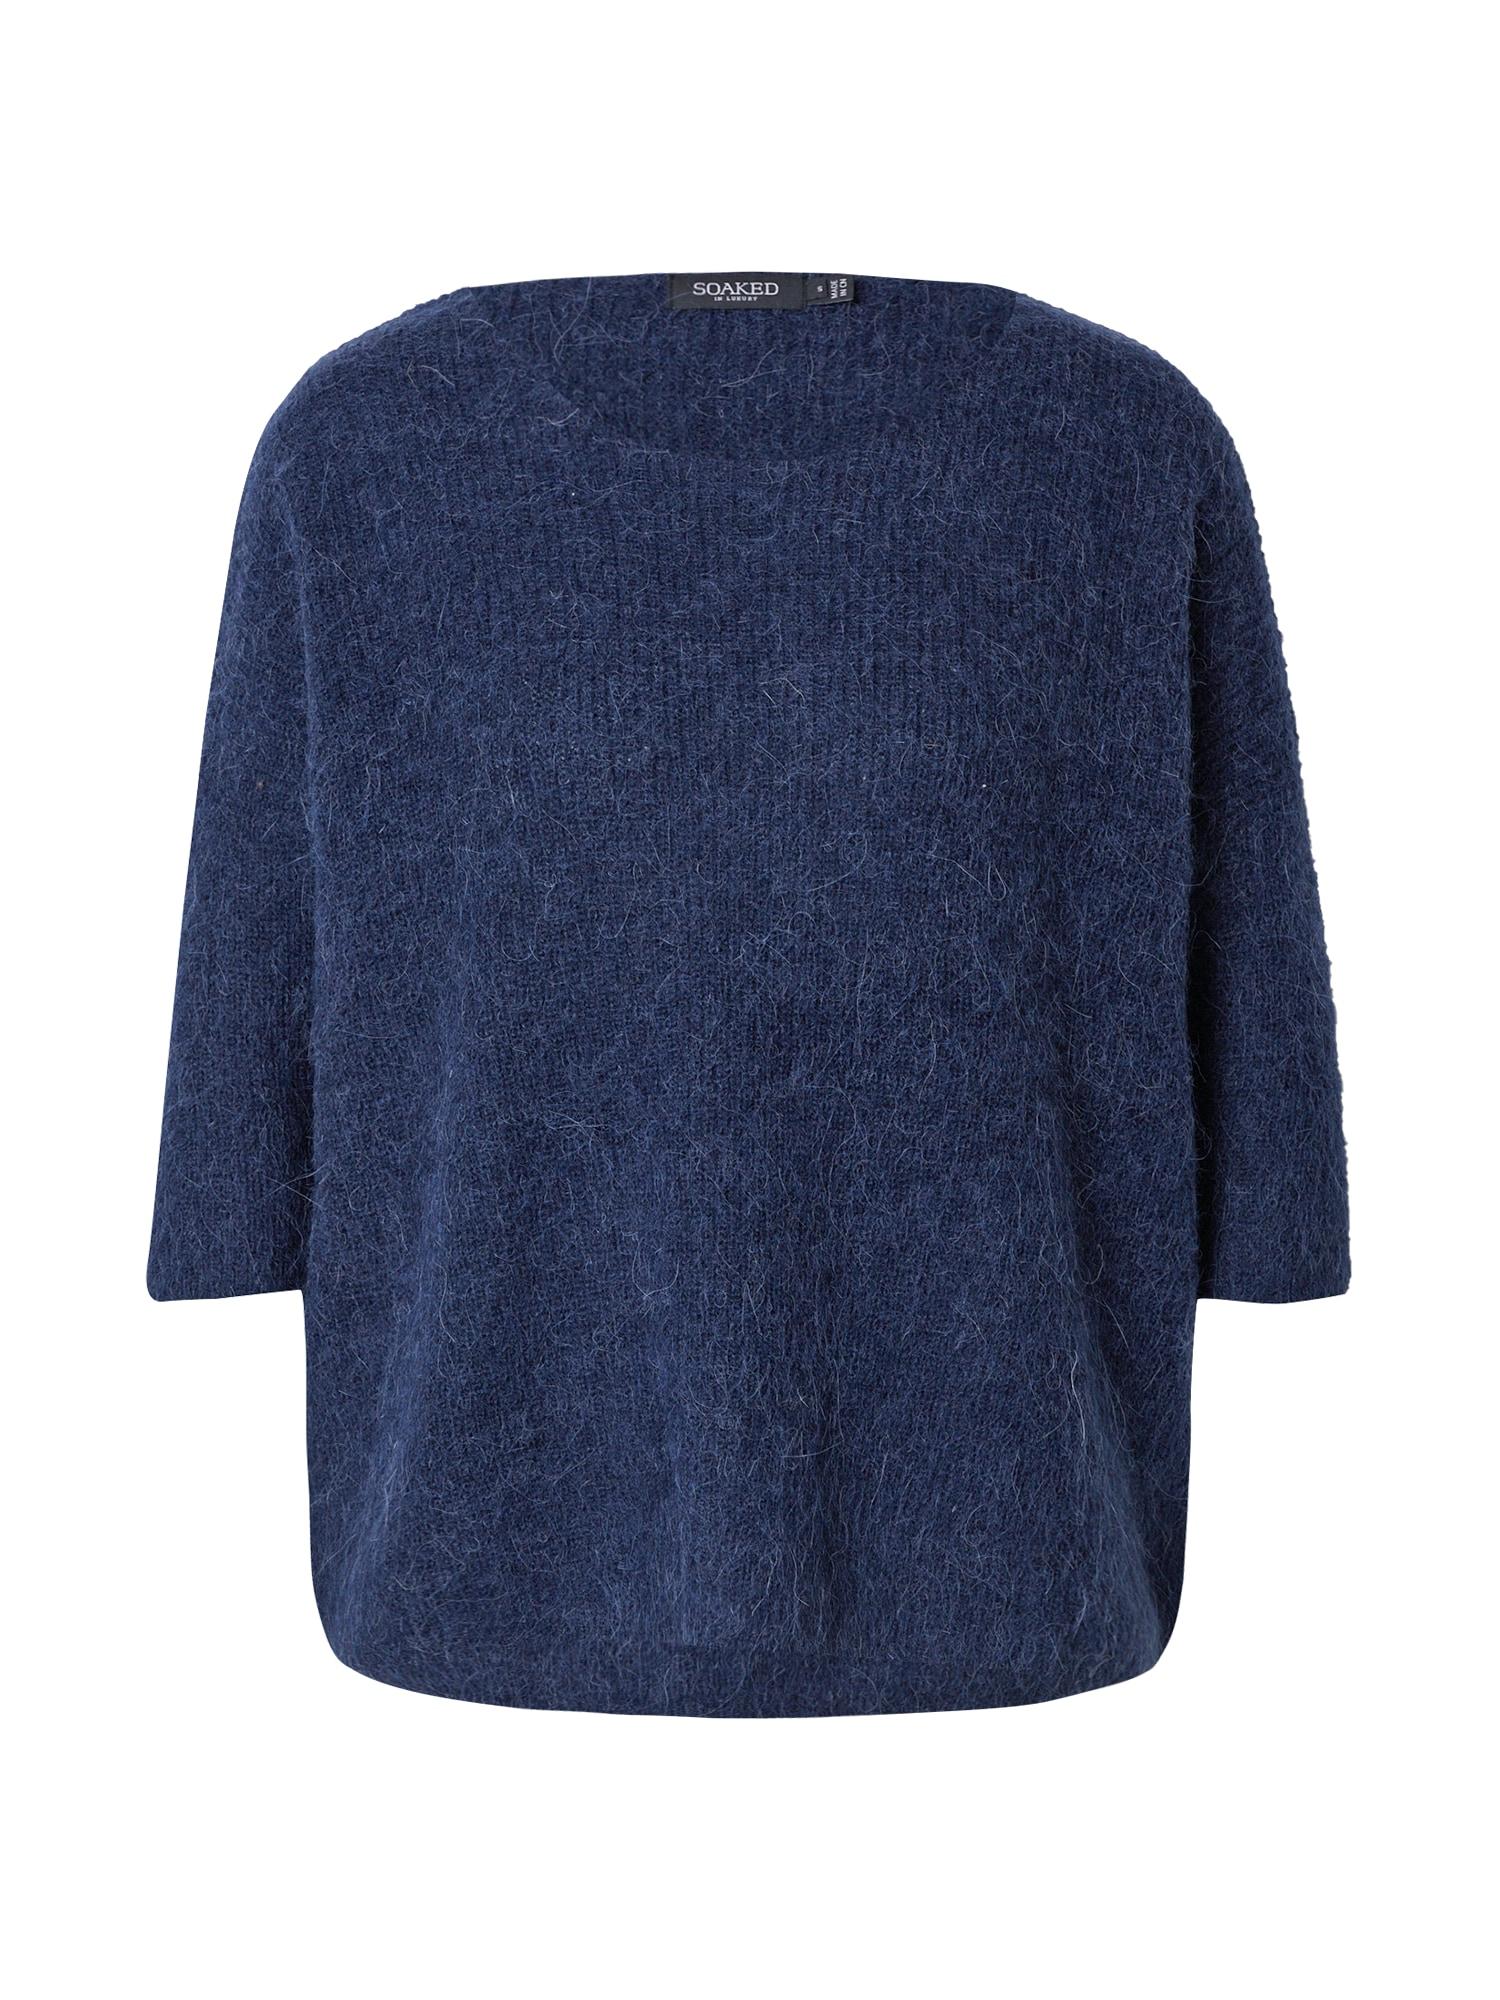 SOAKED IN LUXURY Megztinis